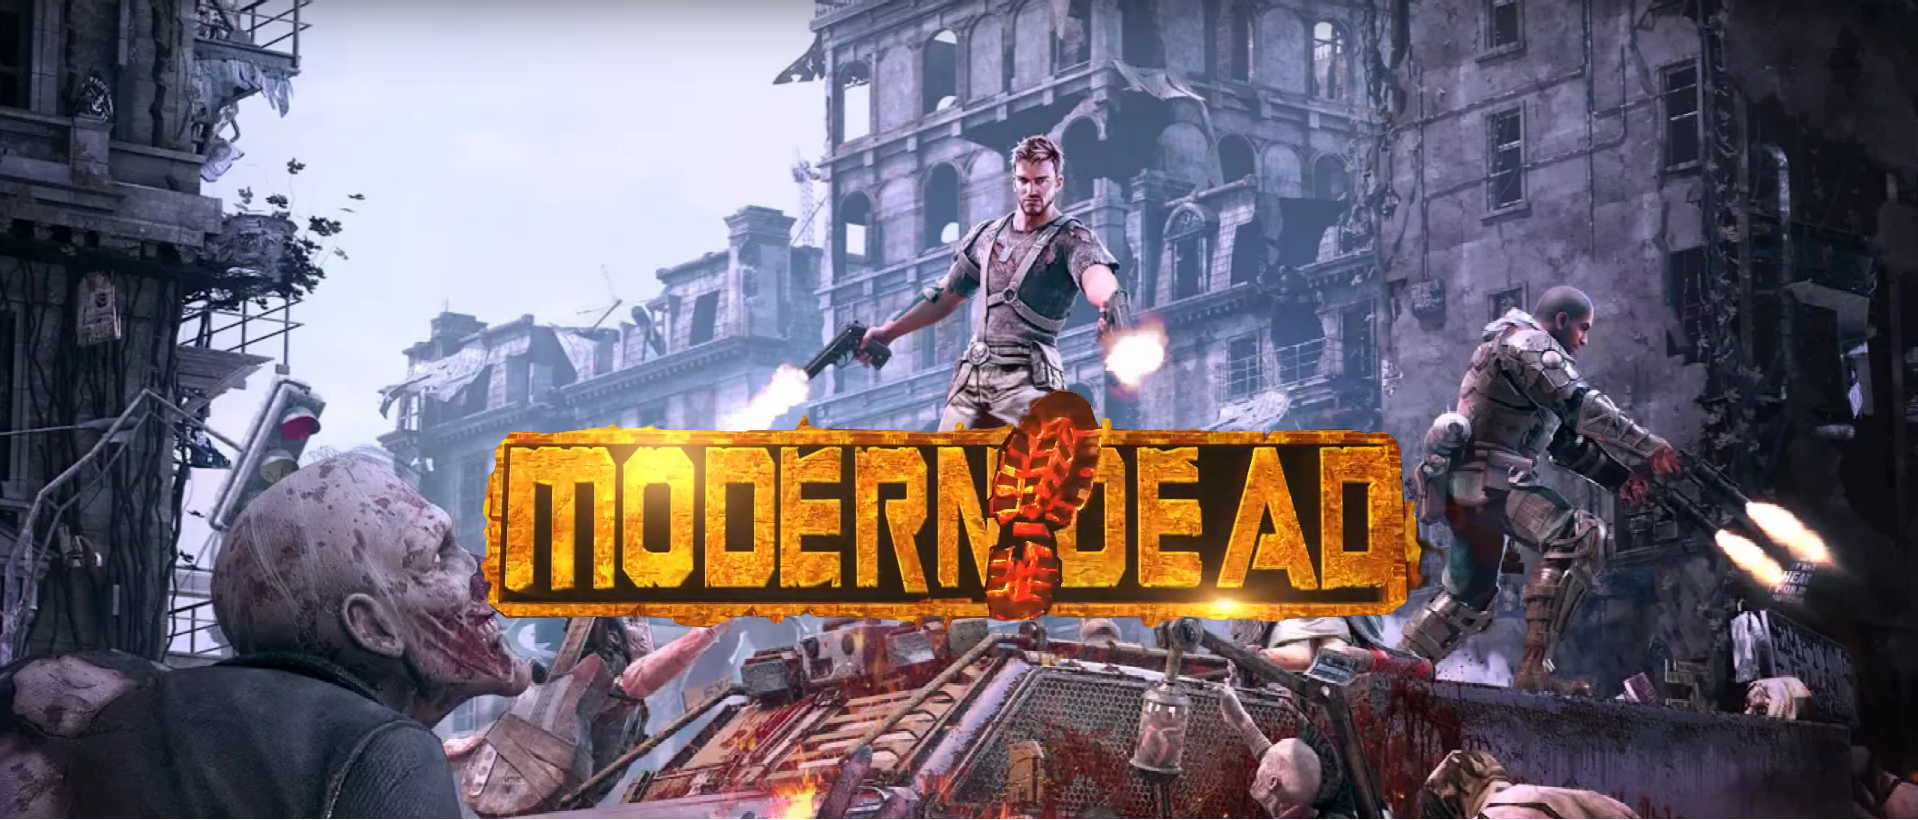 Modern Dead